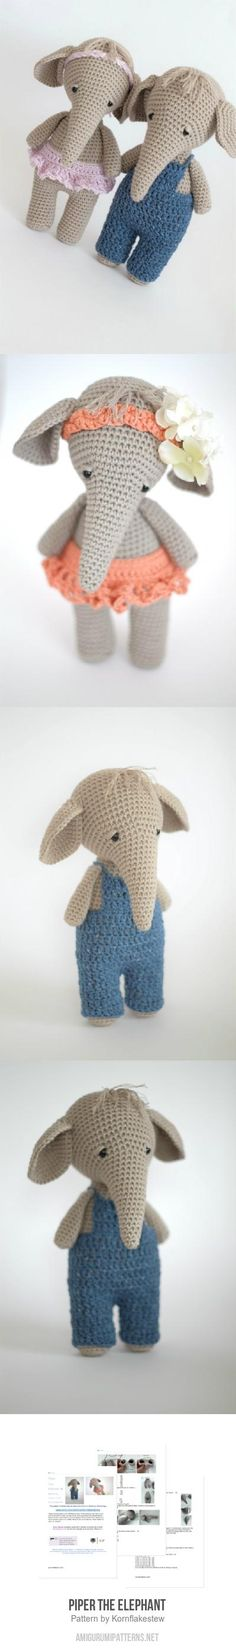 Piper the elephant amigurumi pattern Amigurumi Doll, Amigurumi Patterns, Knitting Patterns, Sewing Patterns, Crochet Patterns, Crochet Ideas, Easy Crochet, Crochet Toys, Free Crochet